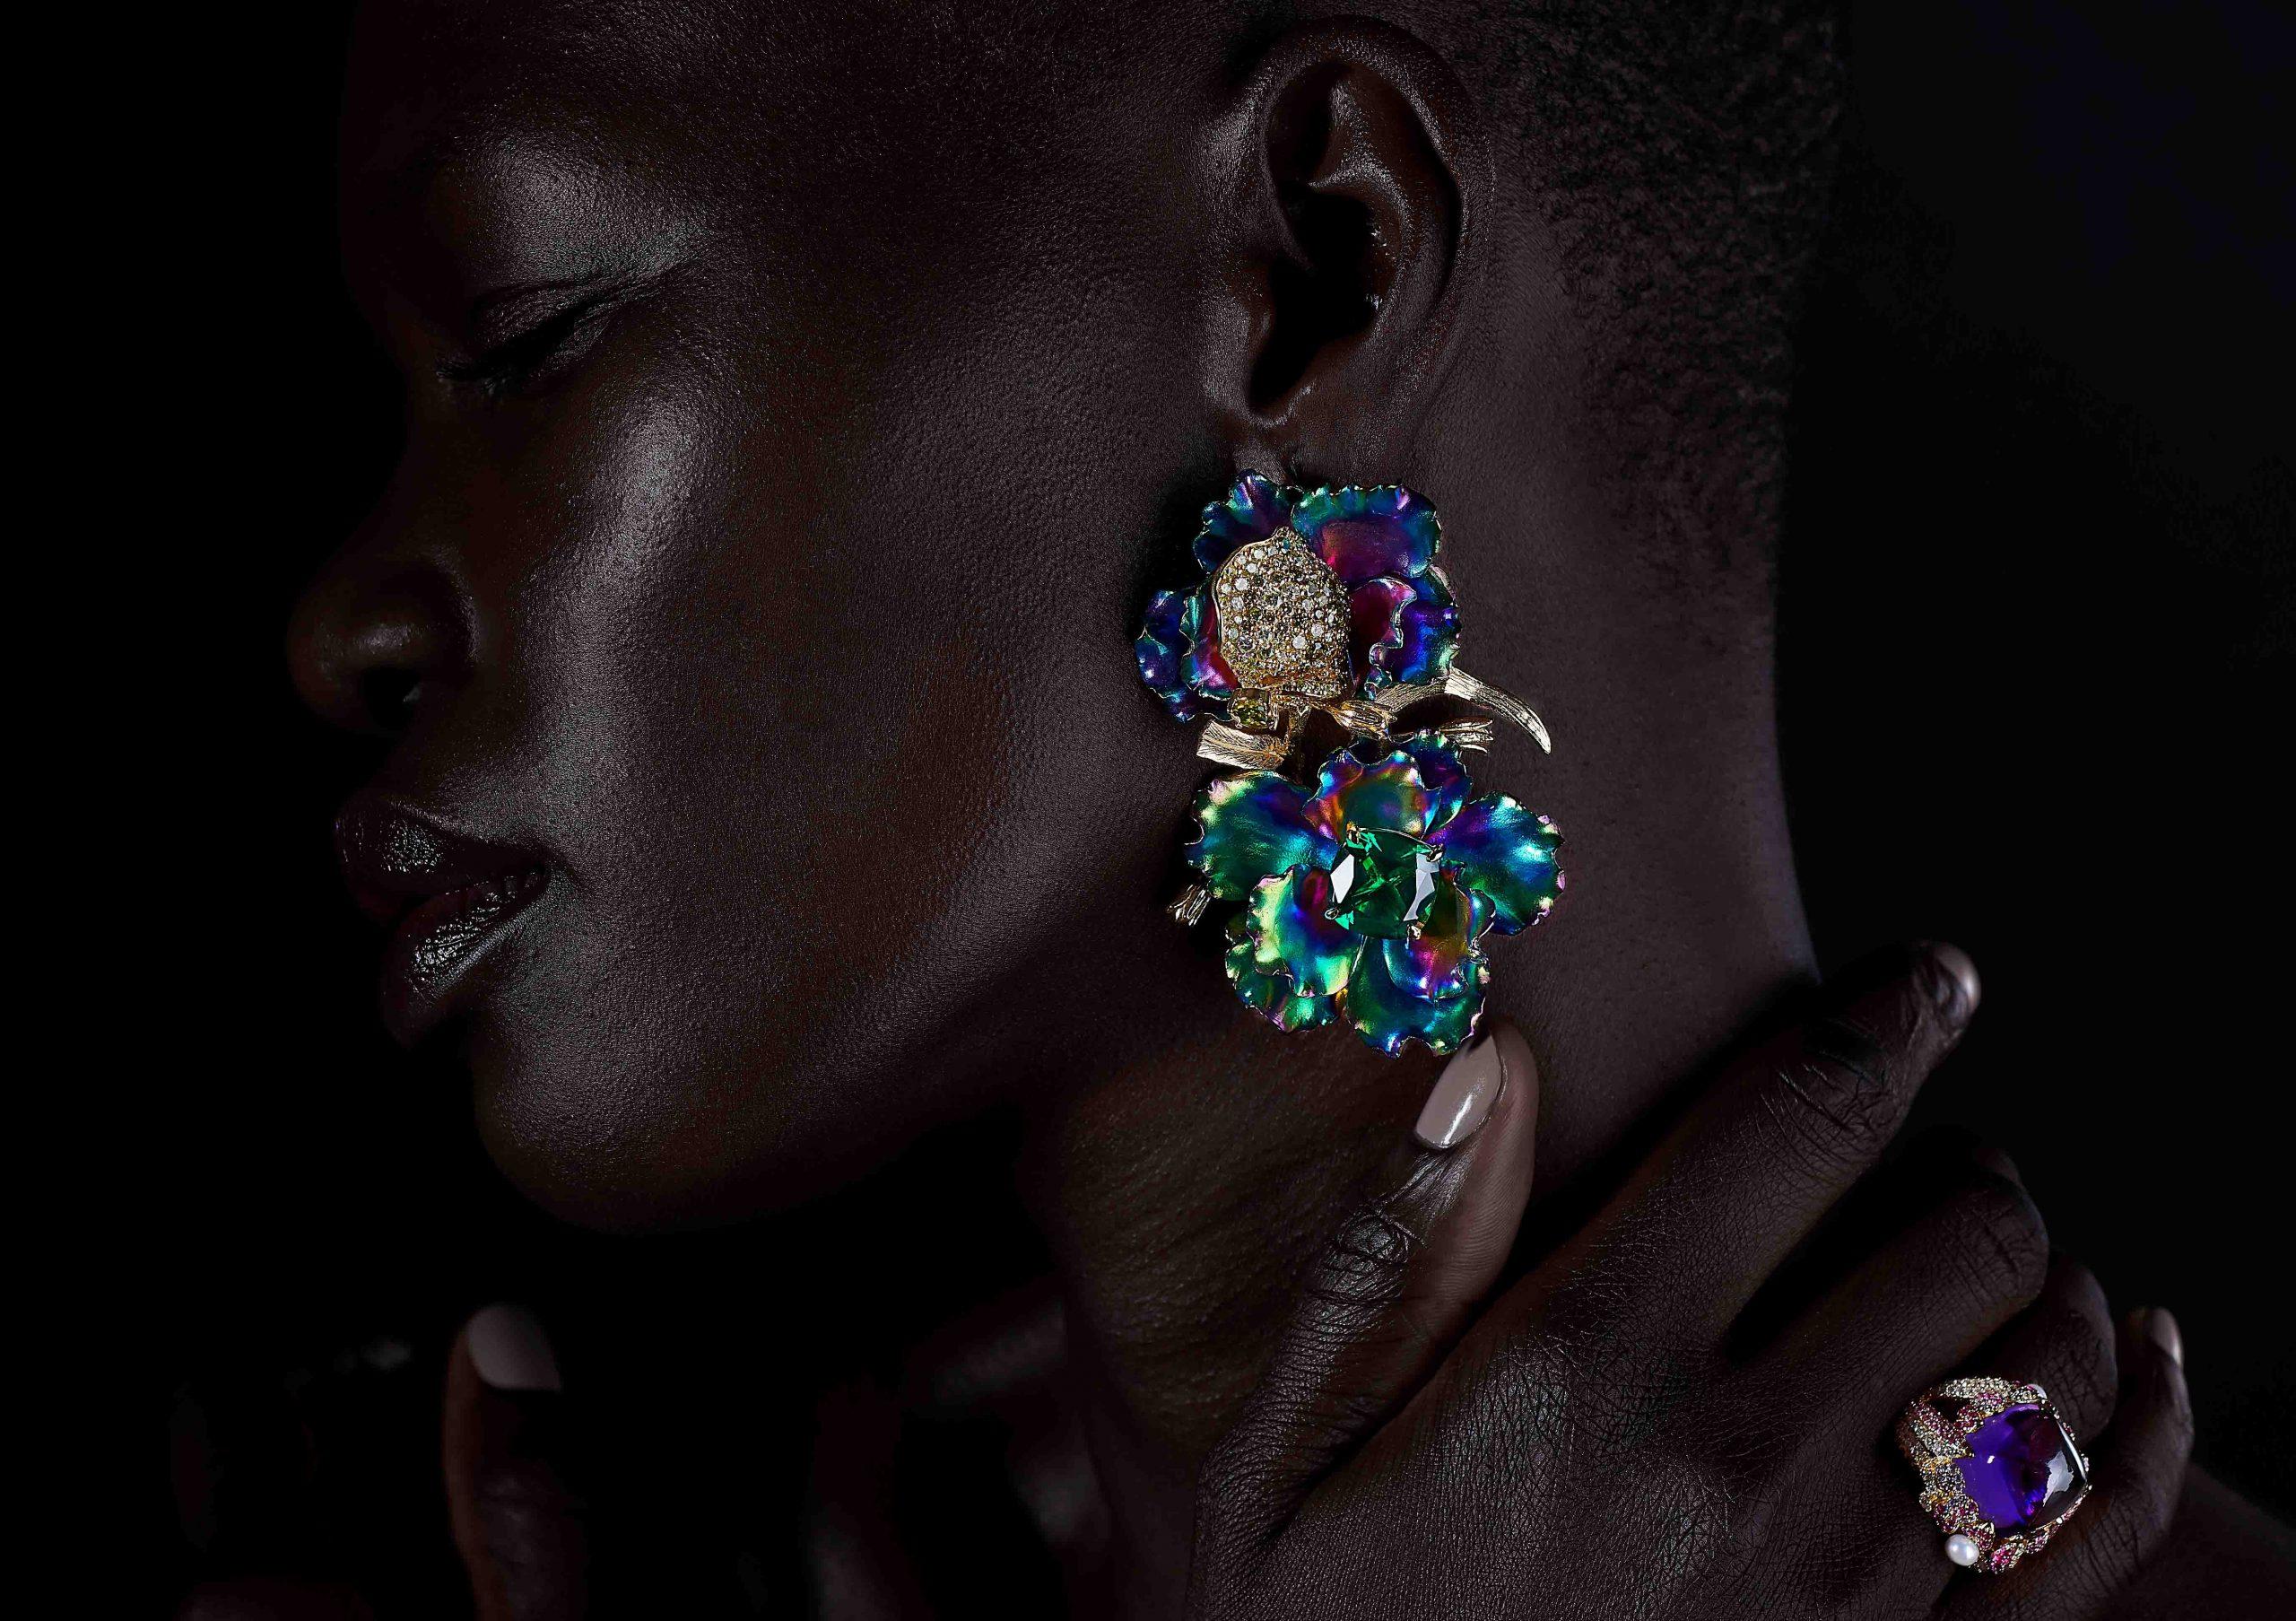 Rainbow Magnolia jewellery by Anabela Chan